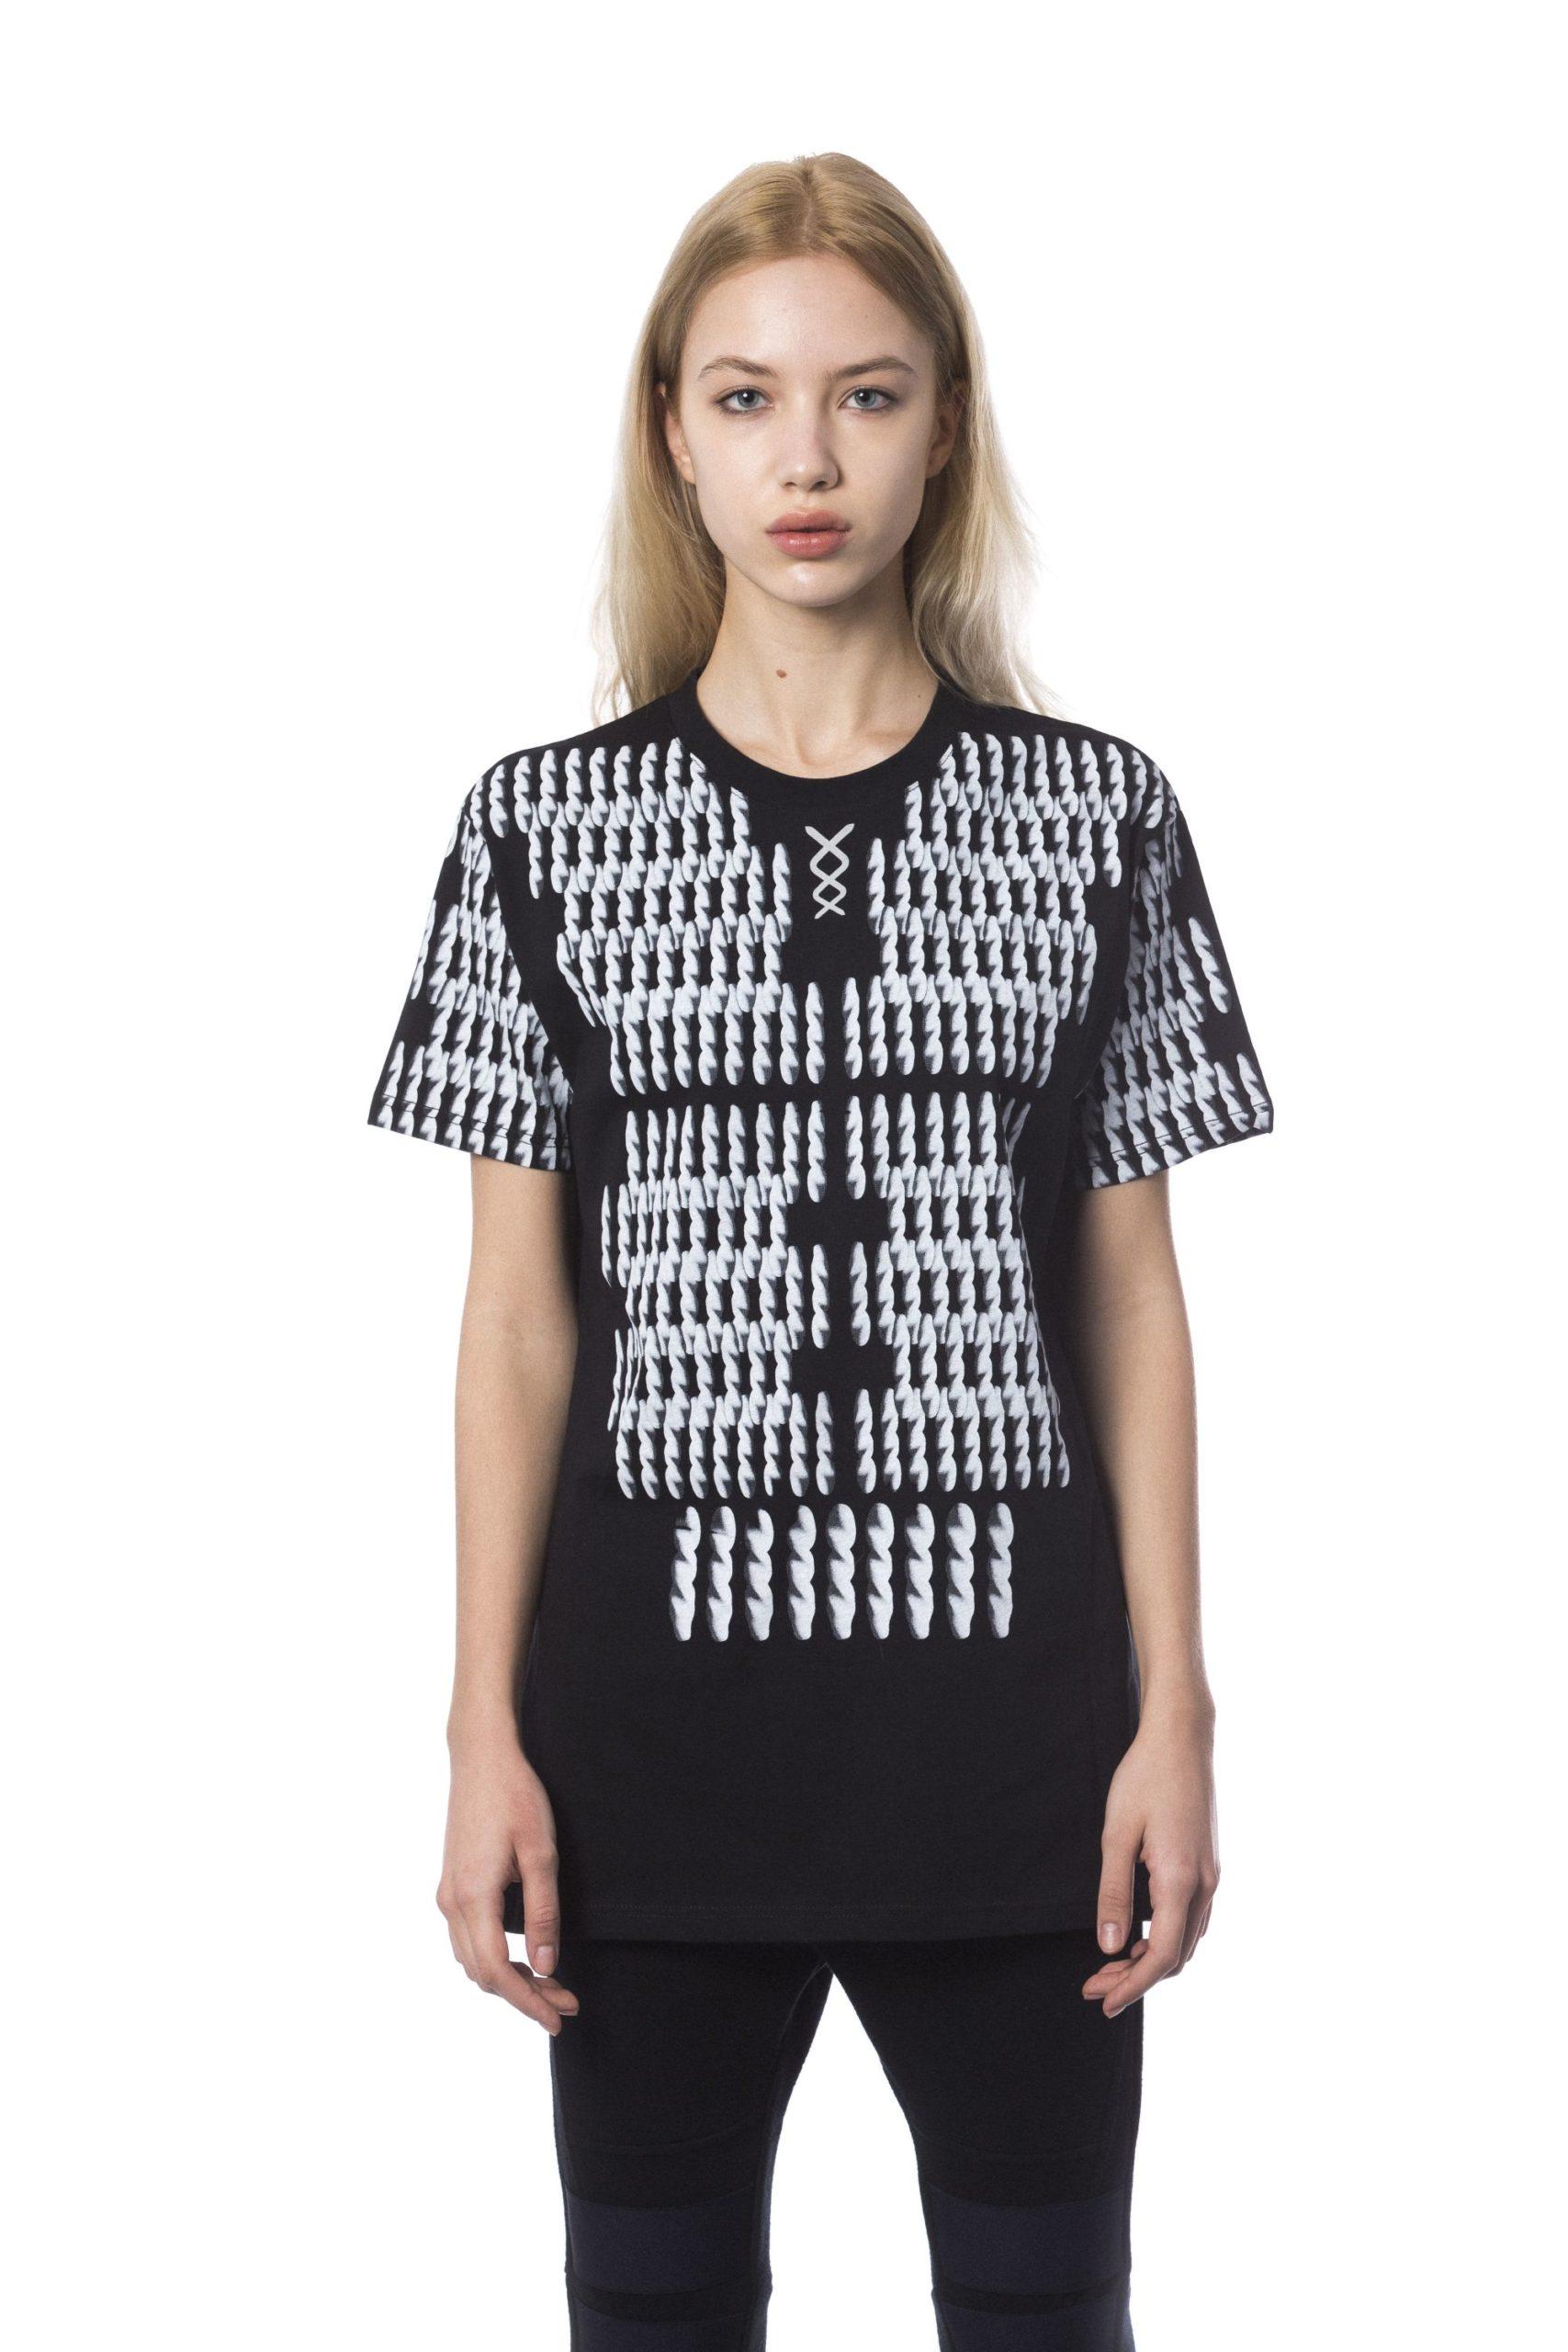 Nicolo Tonetto Men's Nero T-Shirt Black NI1281081 - XL